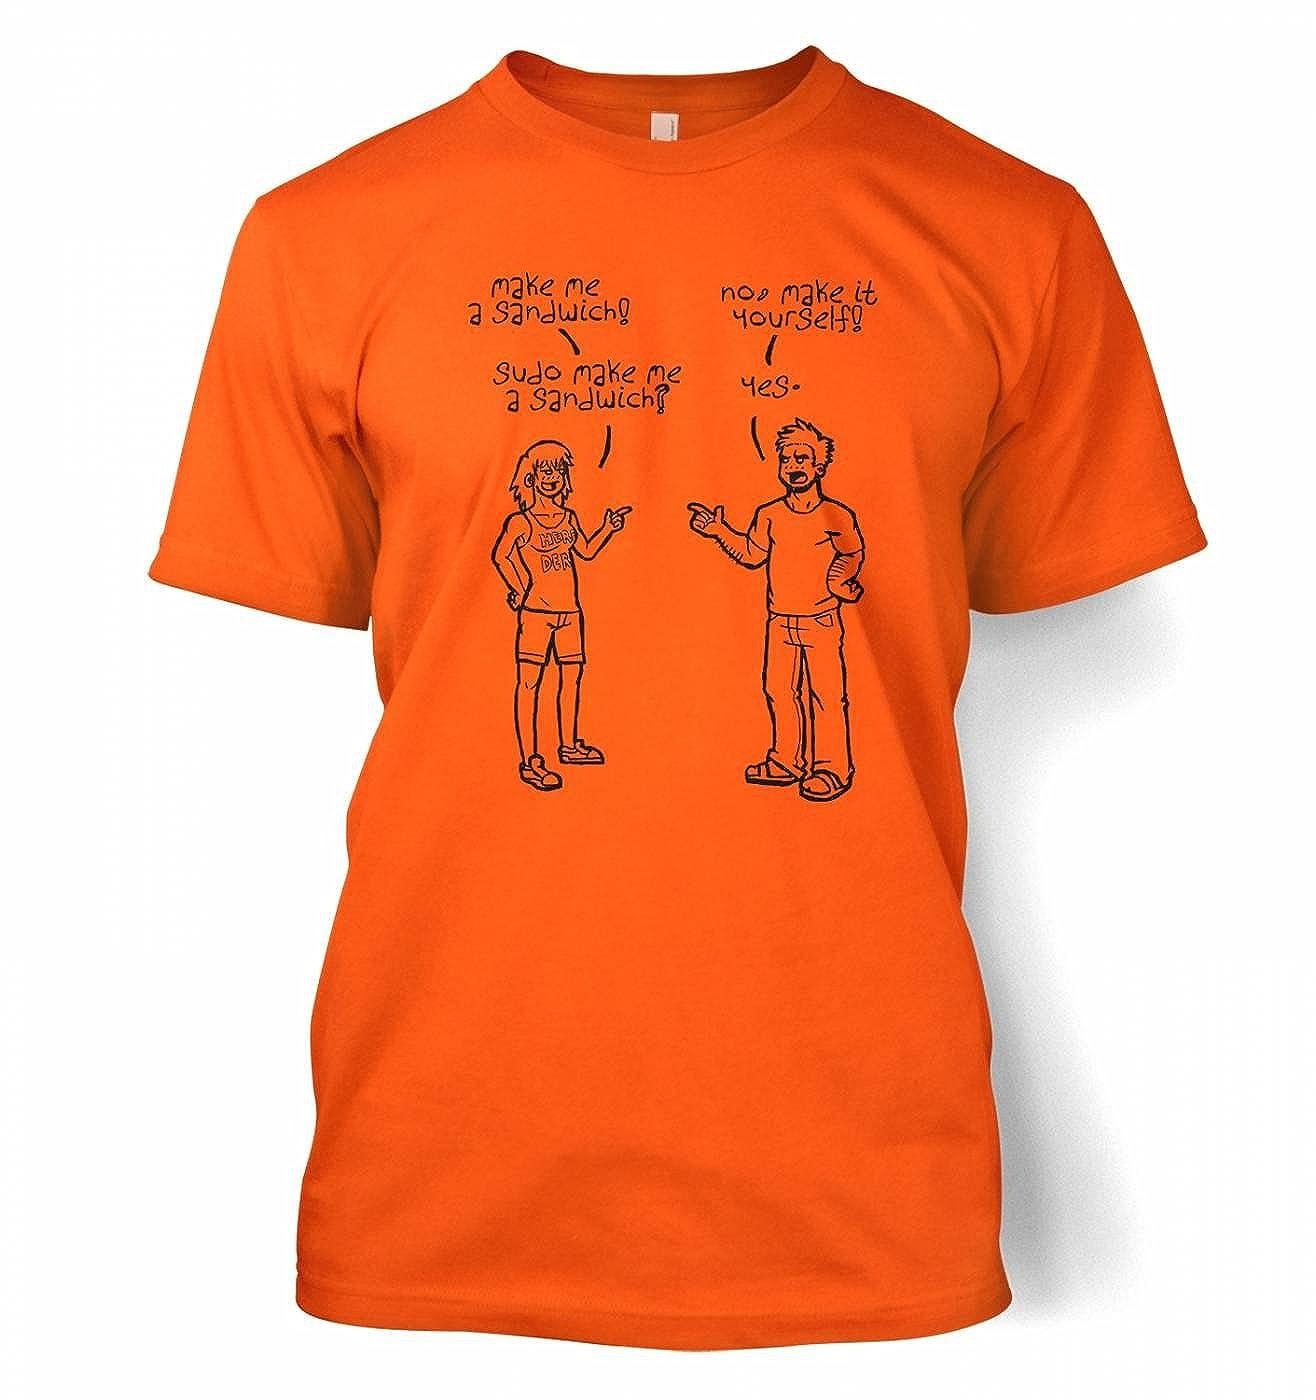 99b348b89 Programming Coding Geeky Tshirt - Sudo Make Me A Sandwich men's t-shirt -  Orange X-Large: Amazon.co.uk: Clothing